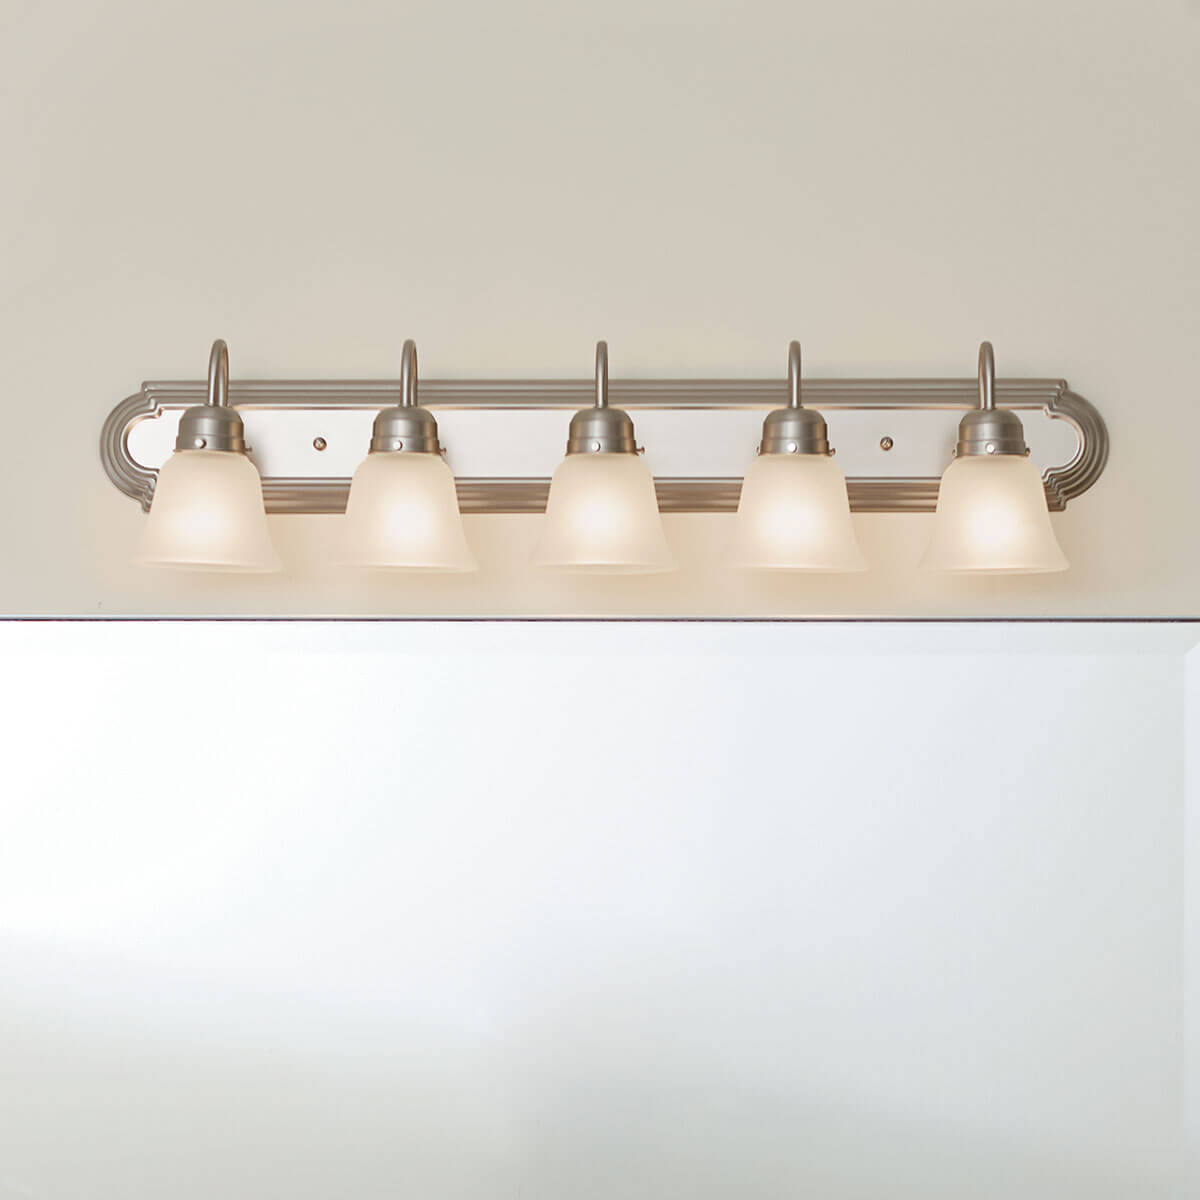 36 5 light vanity light brushed nickel